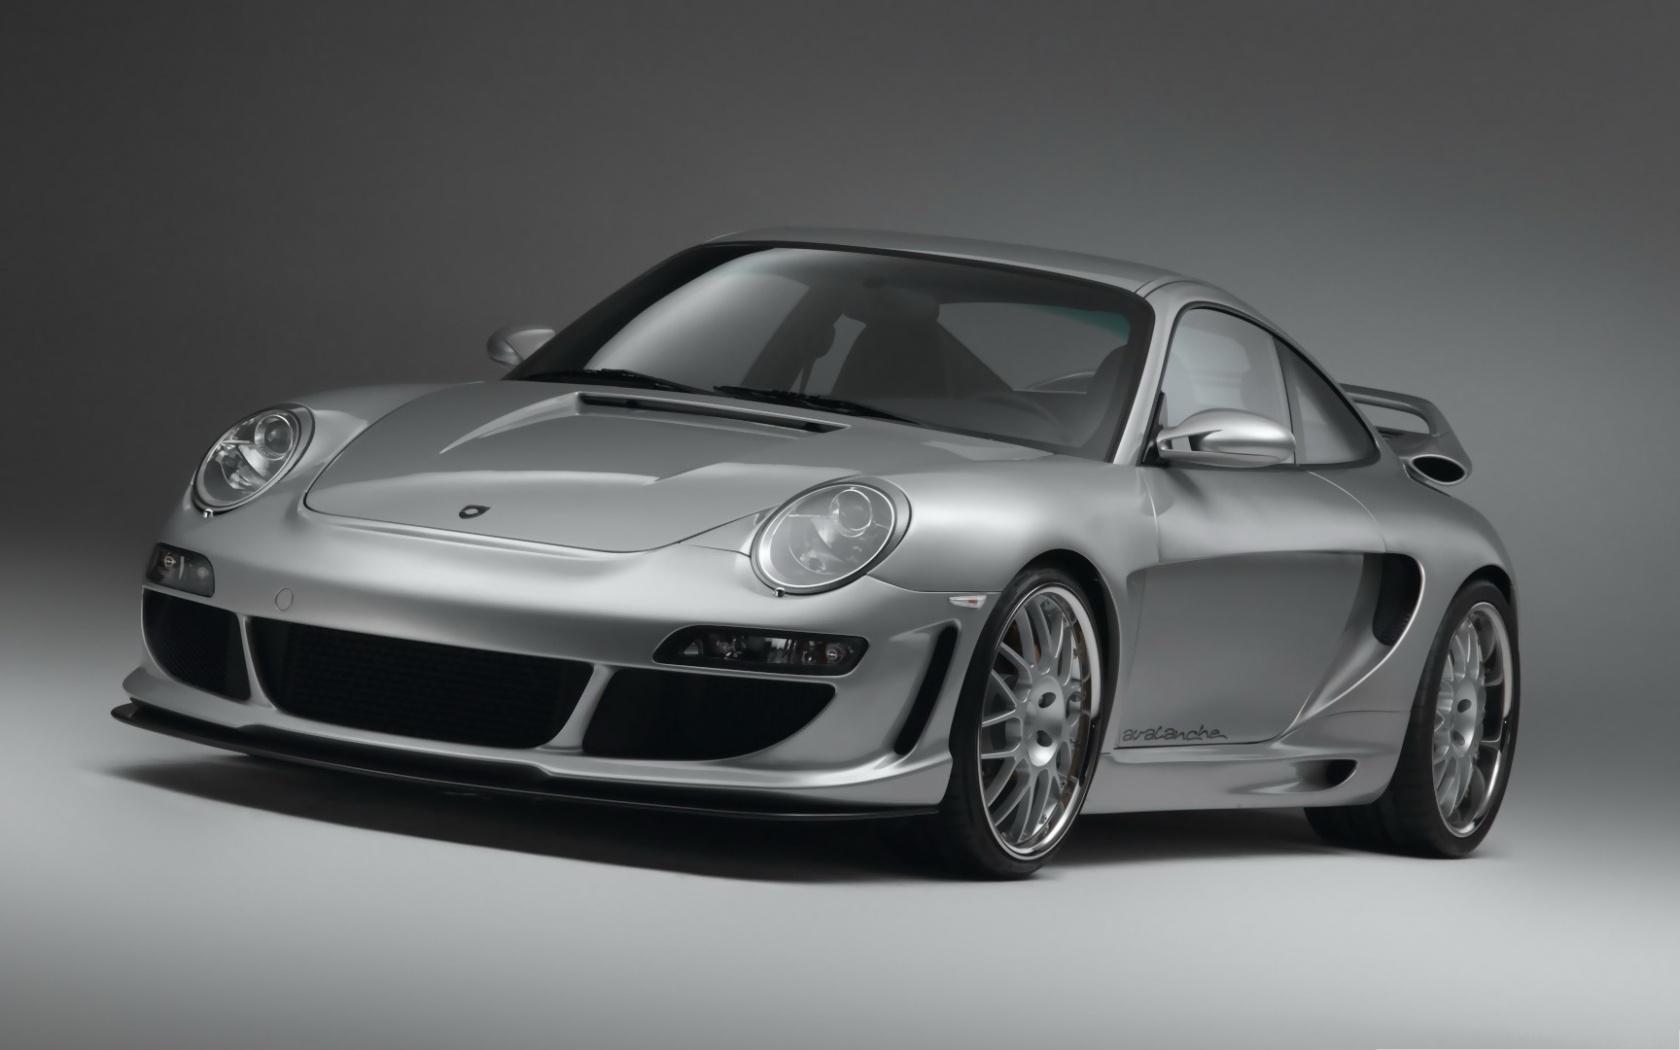 Nice Cars Wallpapers Desktop Top Cars For Desktop Silver Porsche Car On White